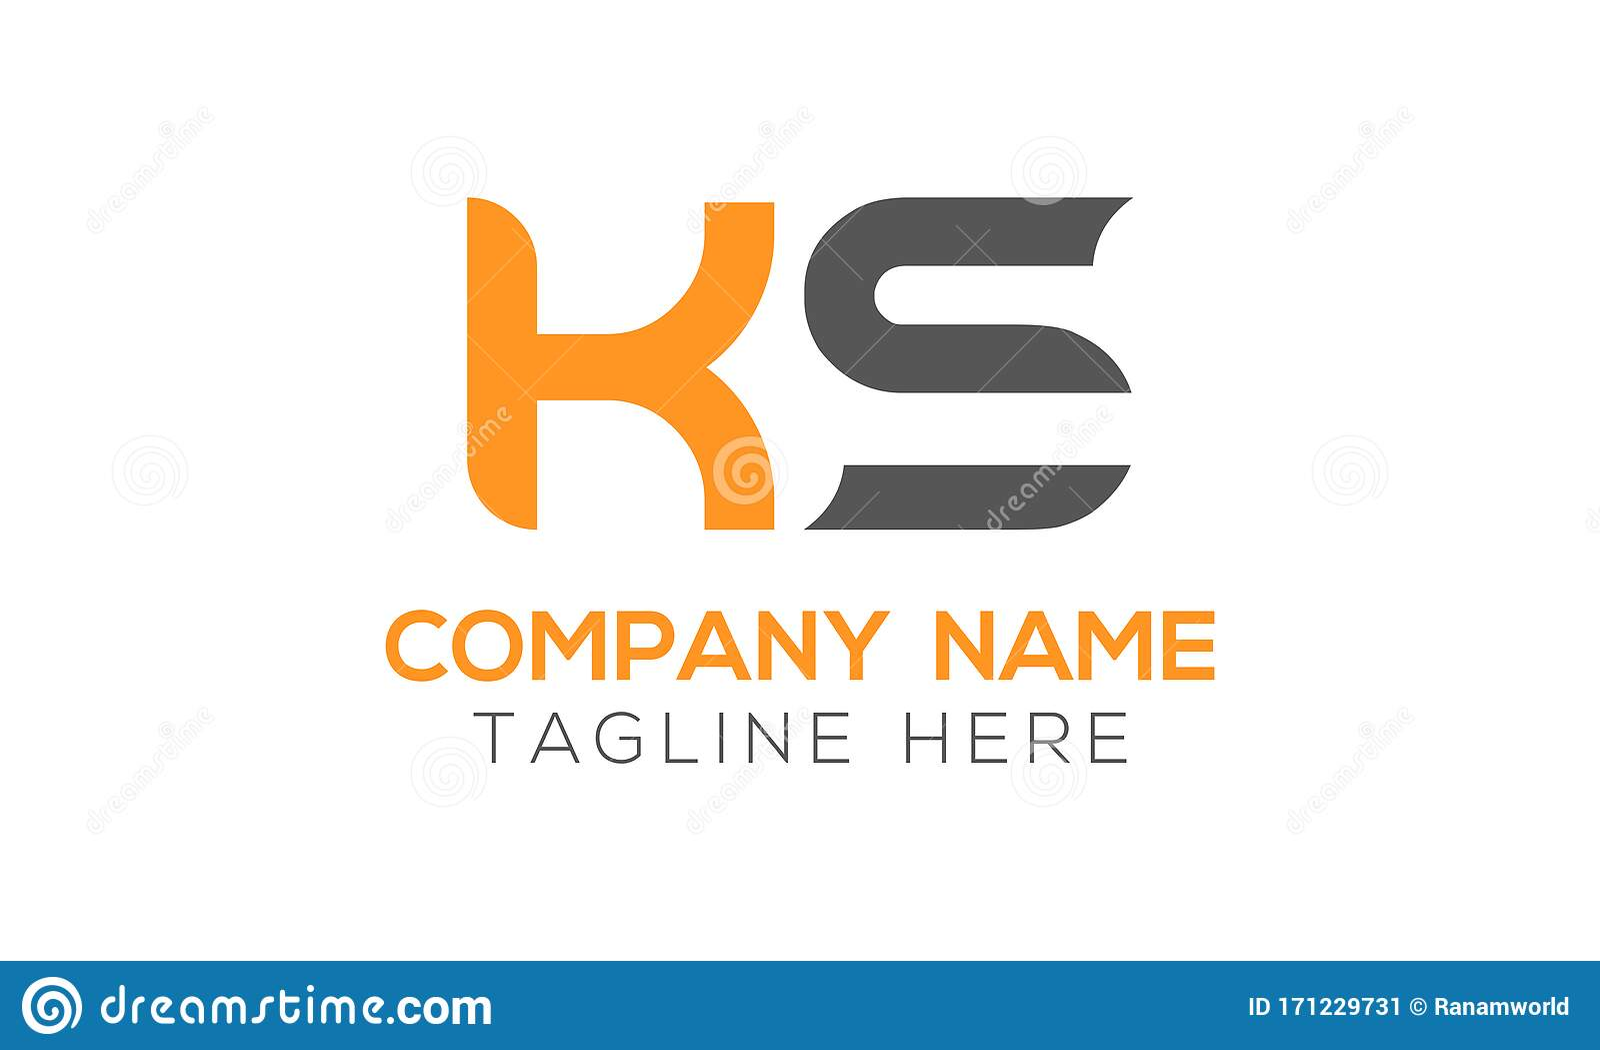 Ks Logo Stock Illustrations 591 Ks Logo Stock Illustrations Vectors Clipart Dreamstime